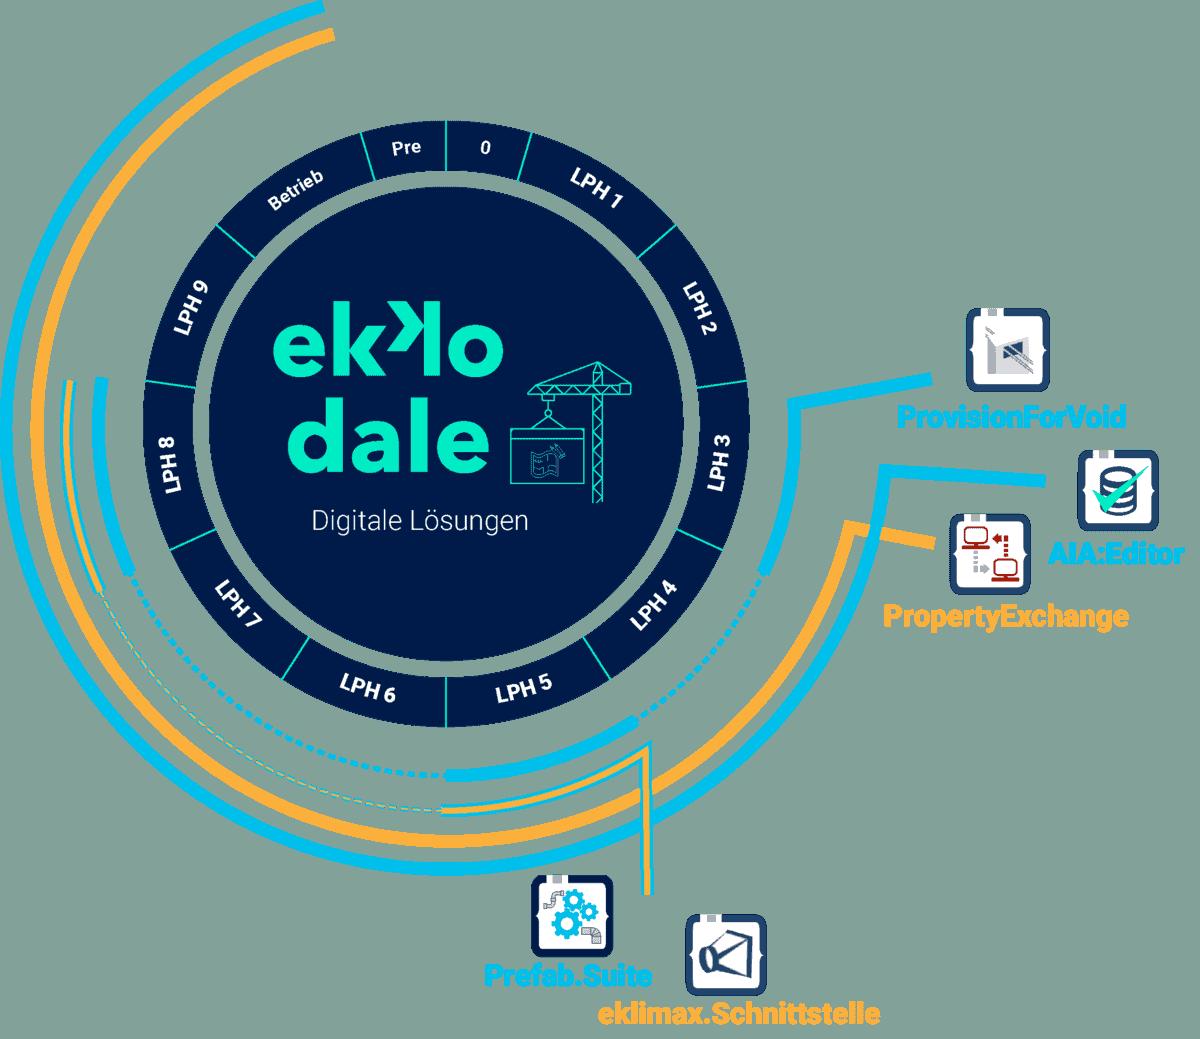 ekkodale tool infographic